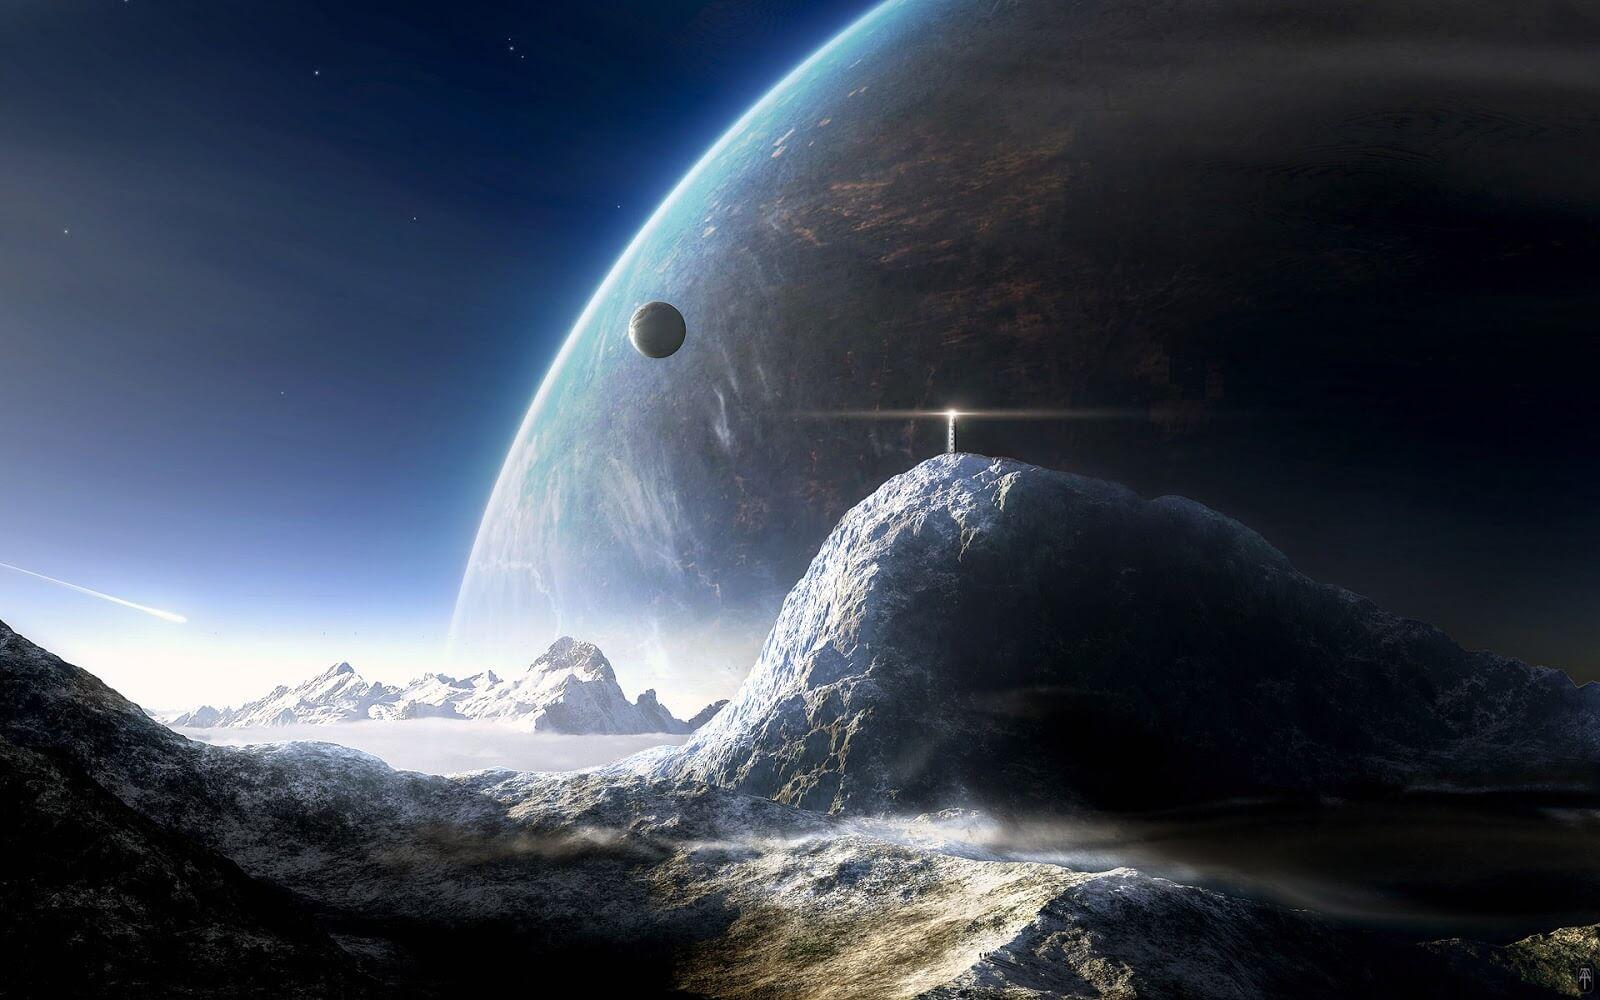 6-28-2018 strange planet